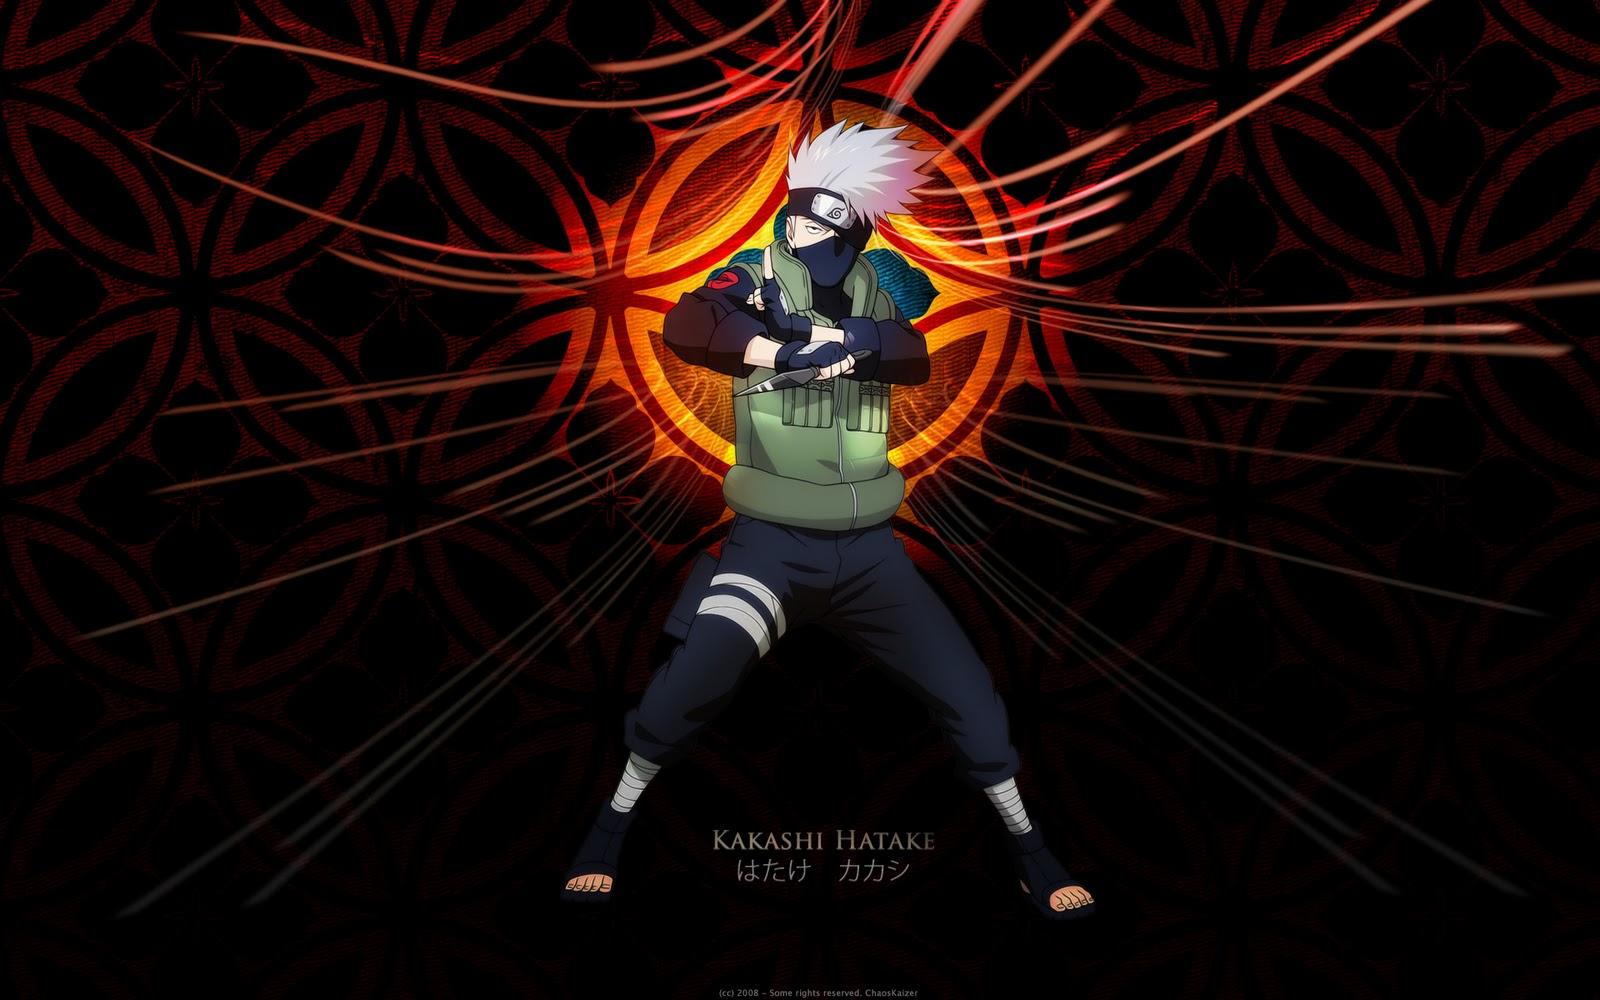 40 Hd Wallpaper Naruto Shippuden 3d: Naruto Shippuden HQ Wallpapers